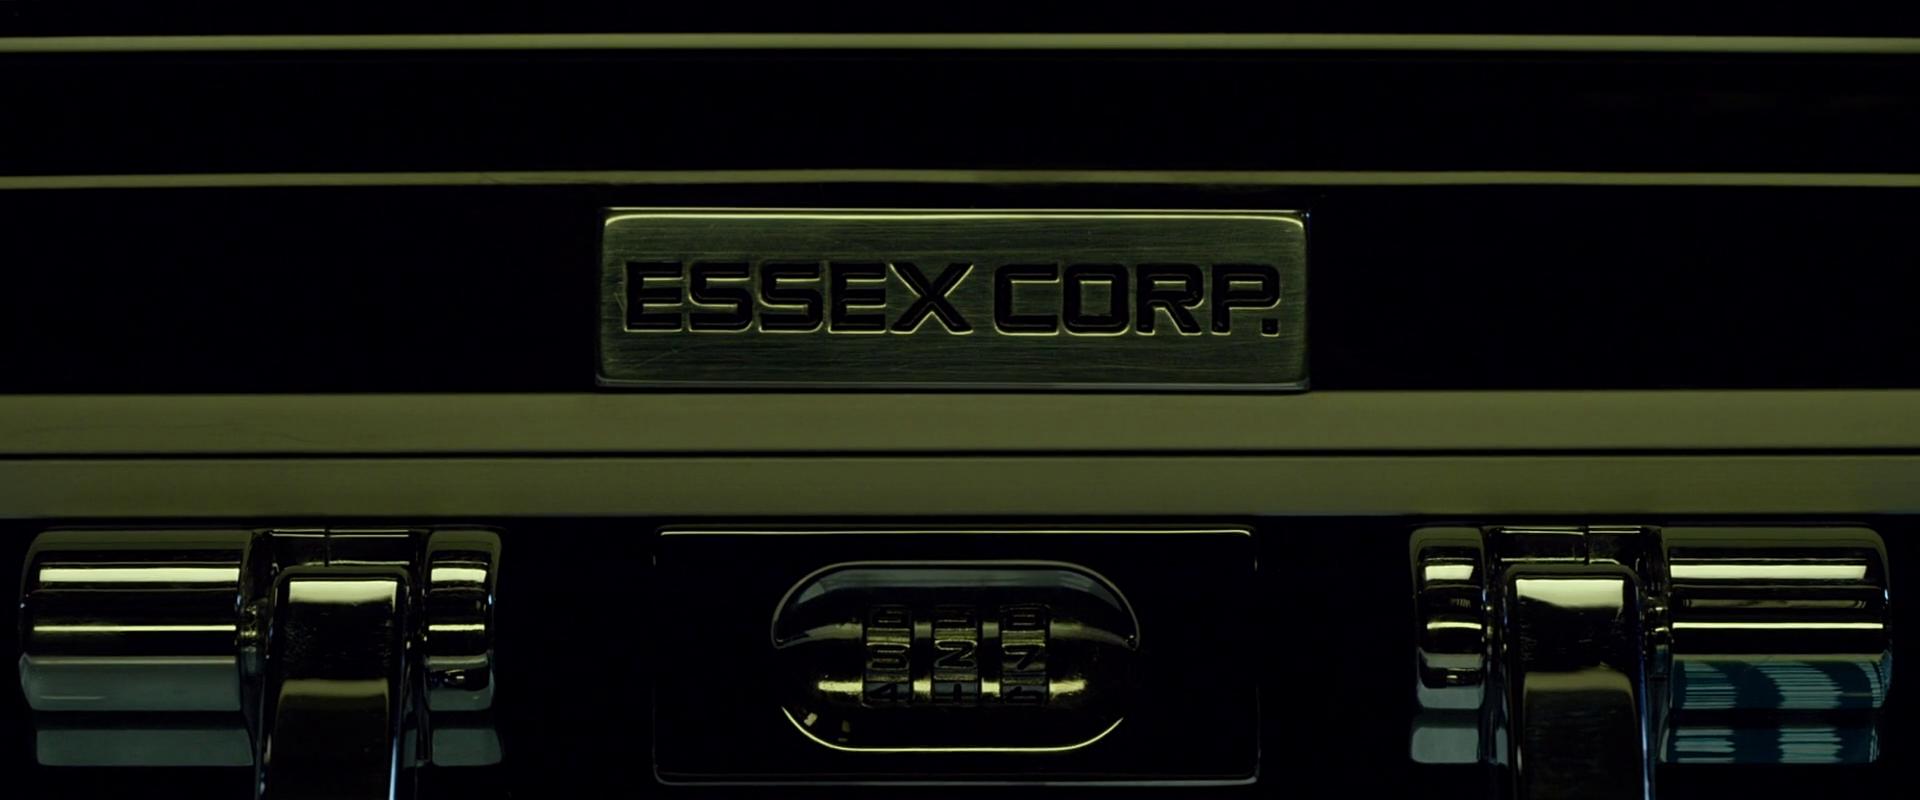 essex_corp_x-men_apocalypse.png